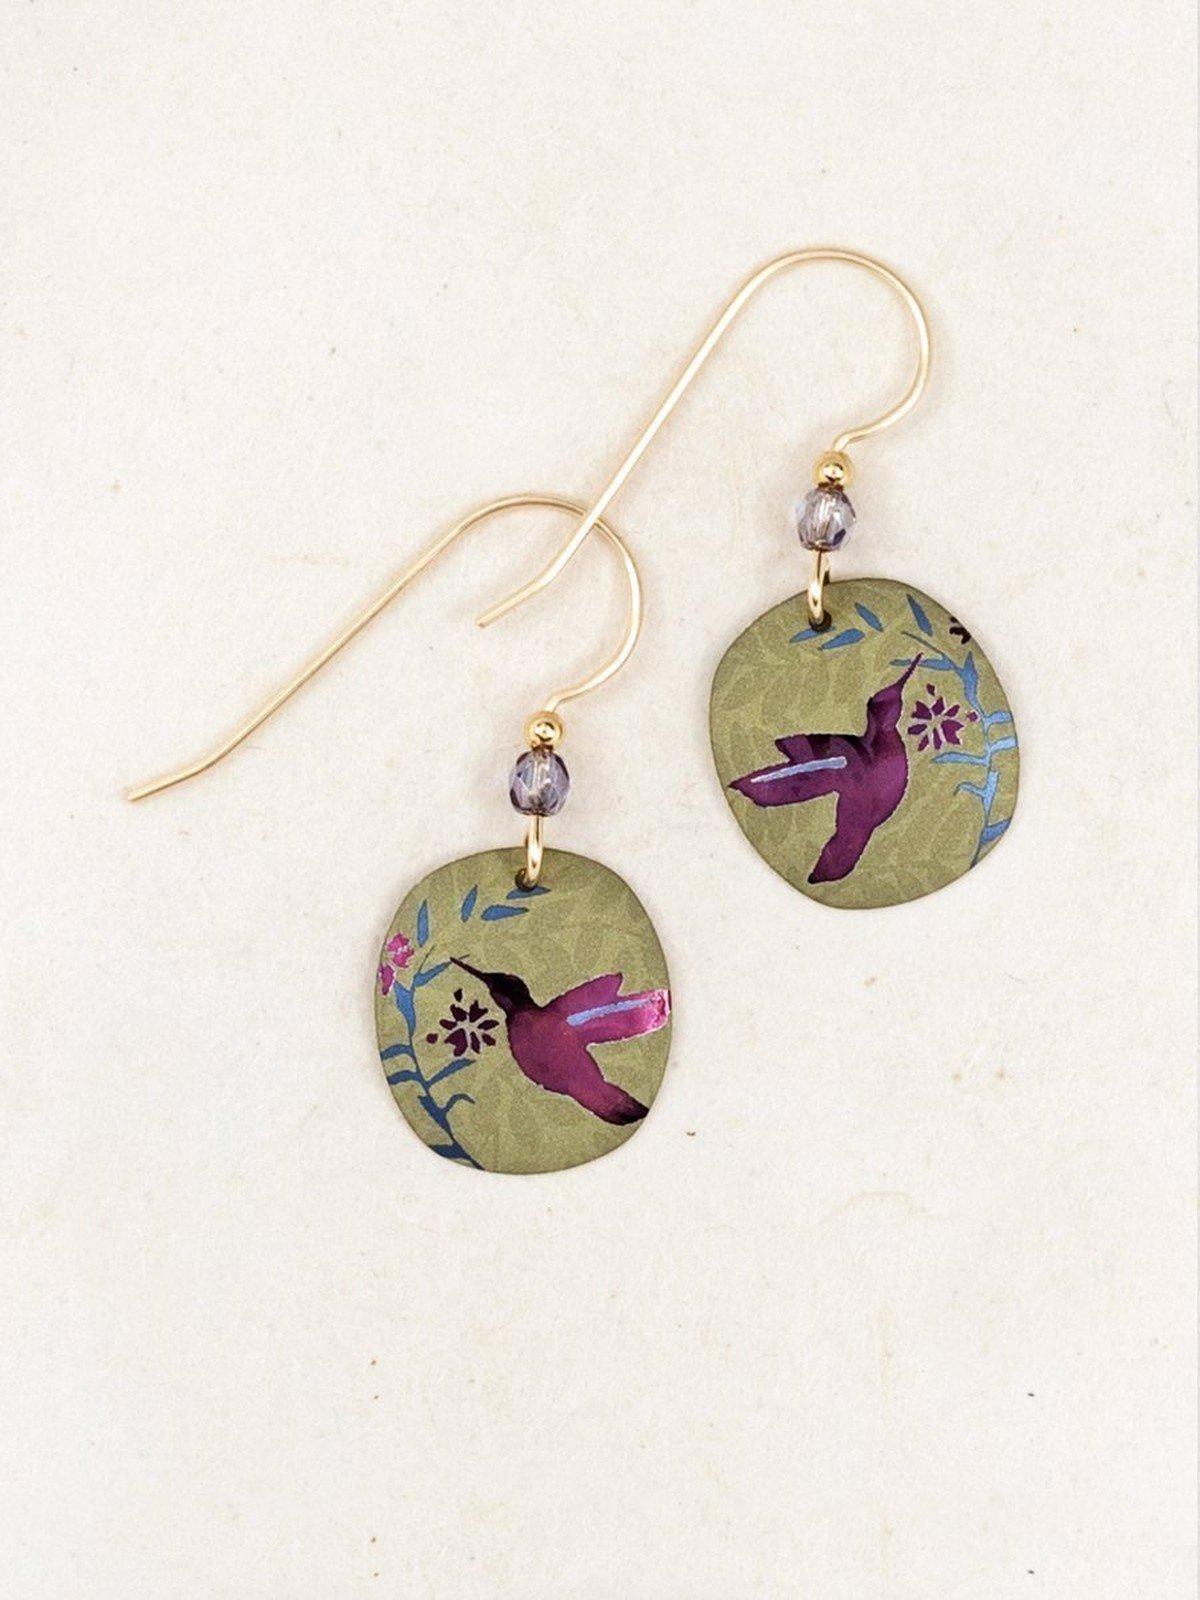 hummingbird earrings by jewelry designer Holly Yashi